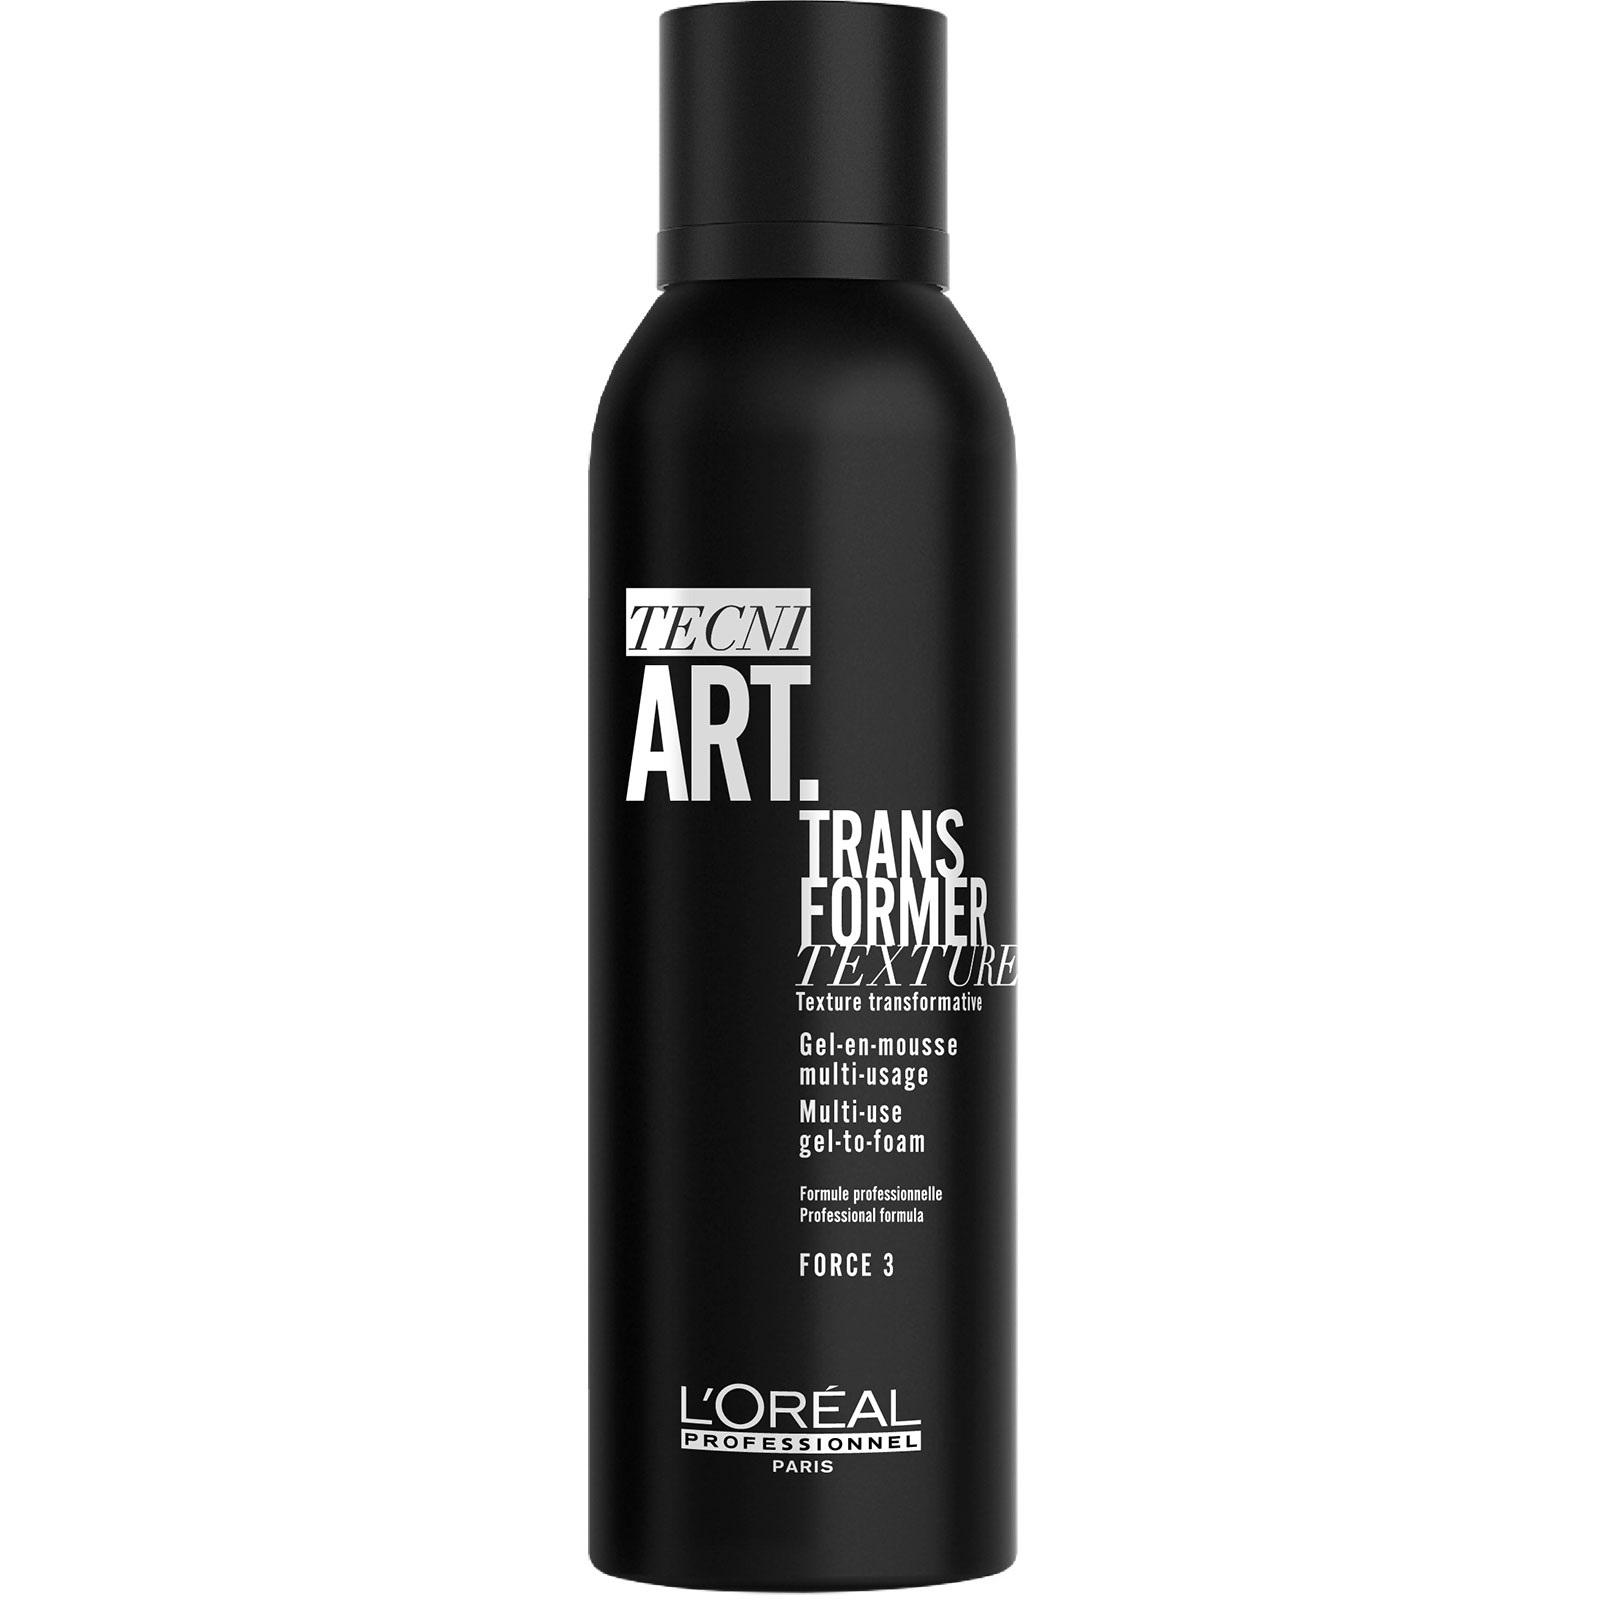 L'OREAL PROFESSIONNEL Гель-мусс трансформер для укладки волос / Tecni.Art Transformer Textura 200 мл